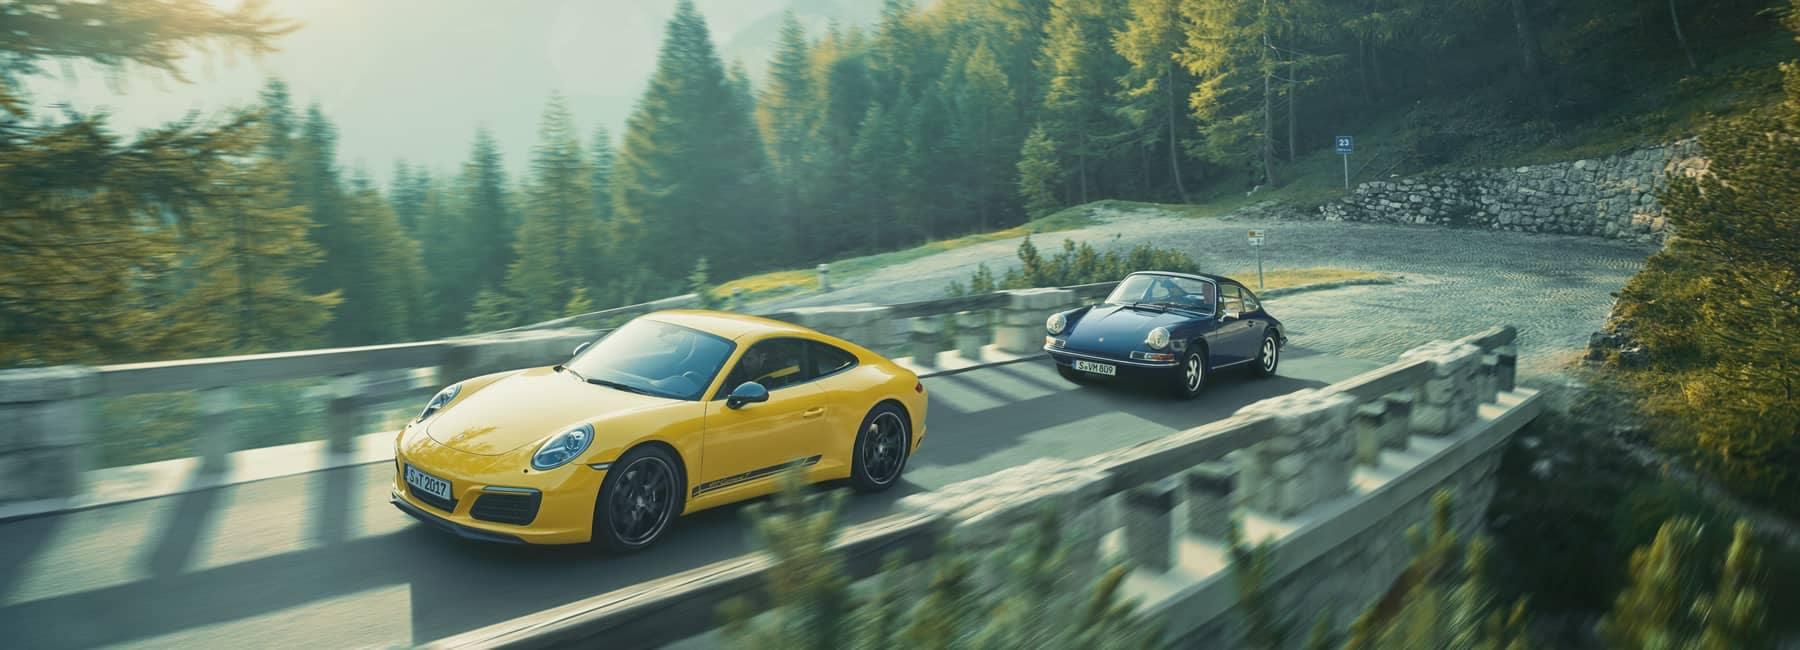 911-Carrera-T